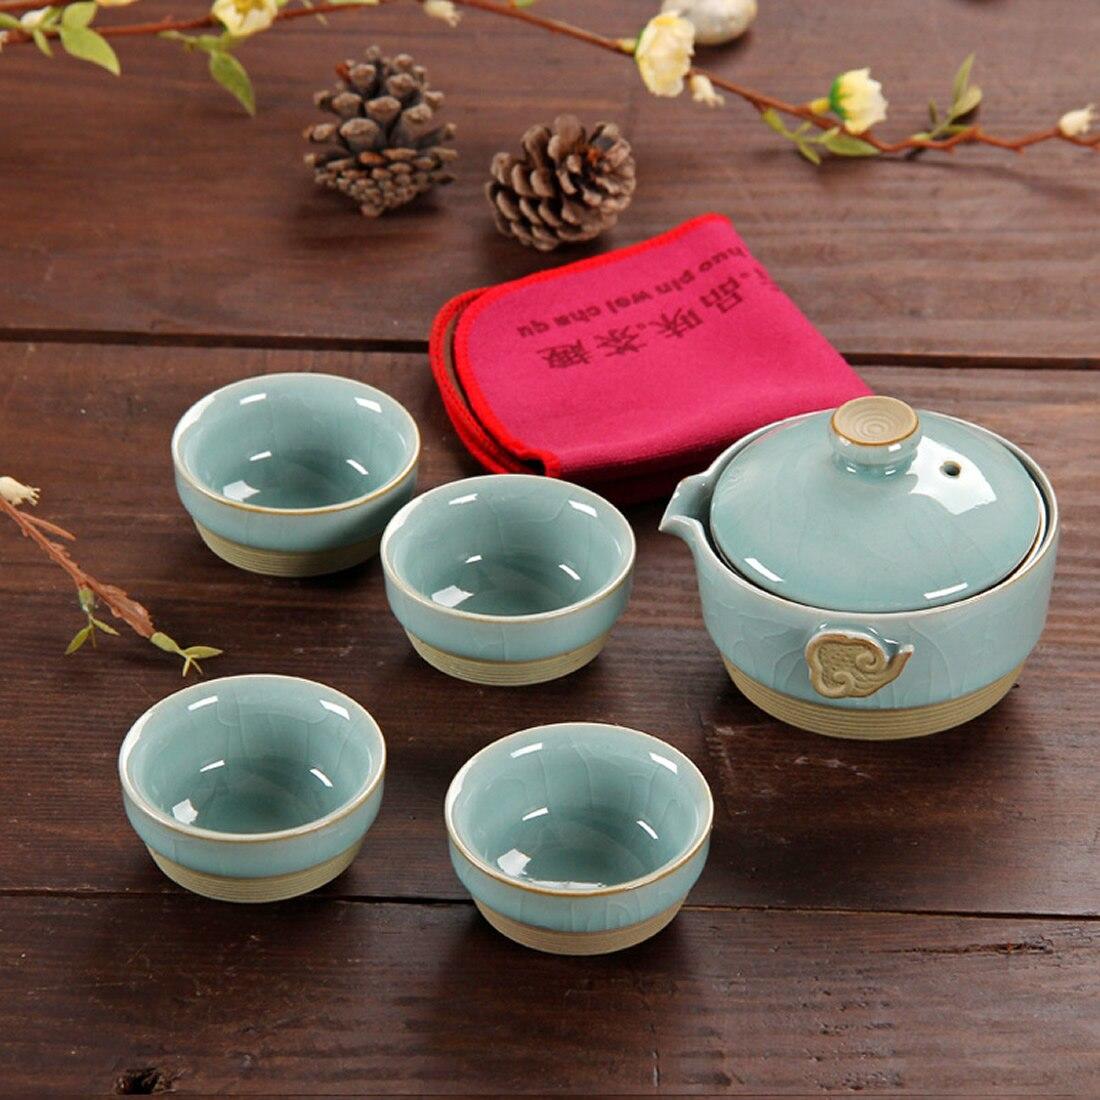 5Pcs Set Chinese Kung Fu Tea Sets Ceramic Portable Teacup Porcelain Service Teacups Teapot Home Travel